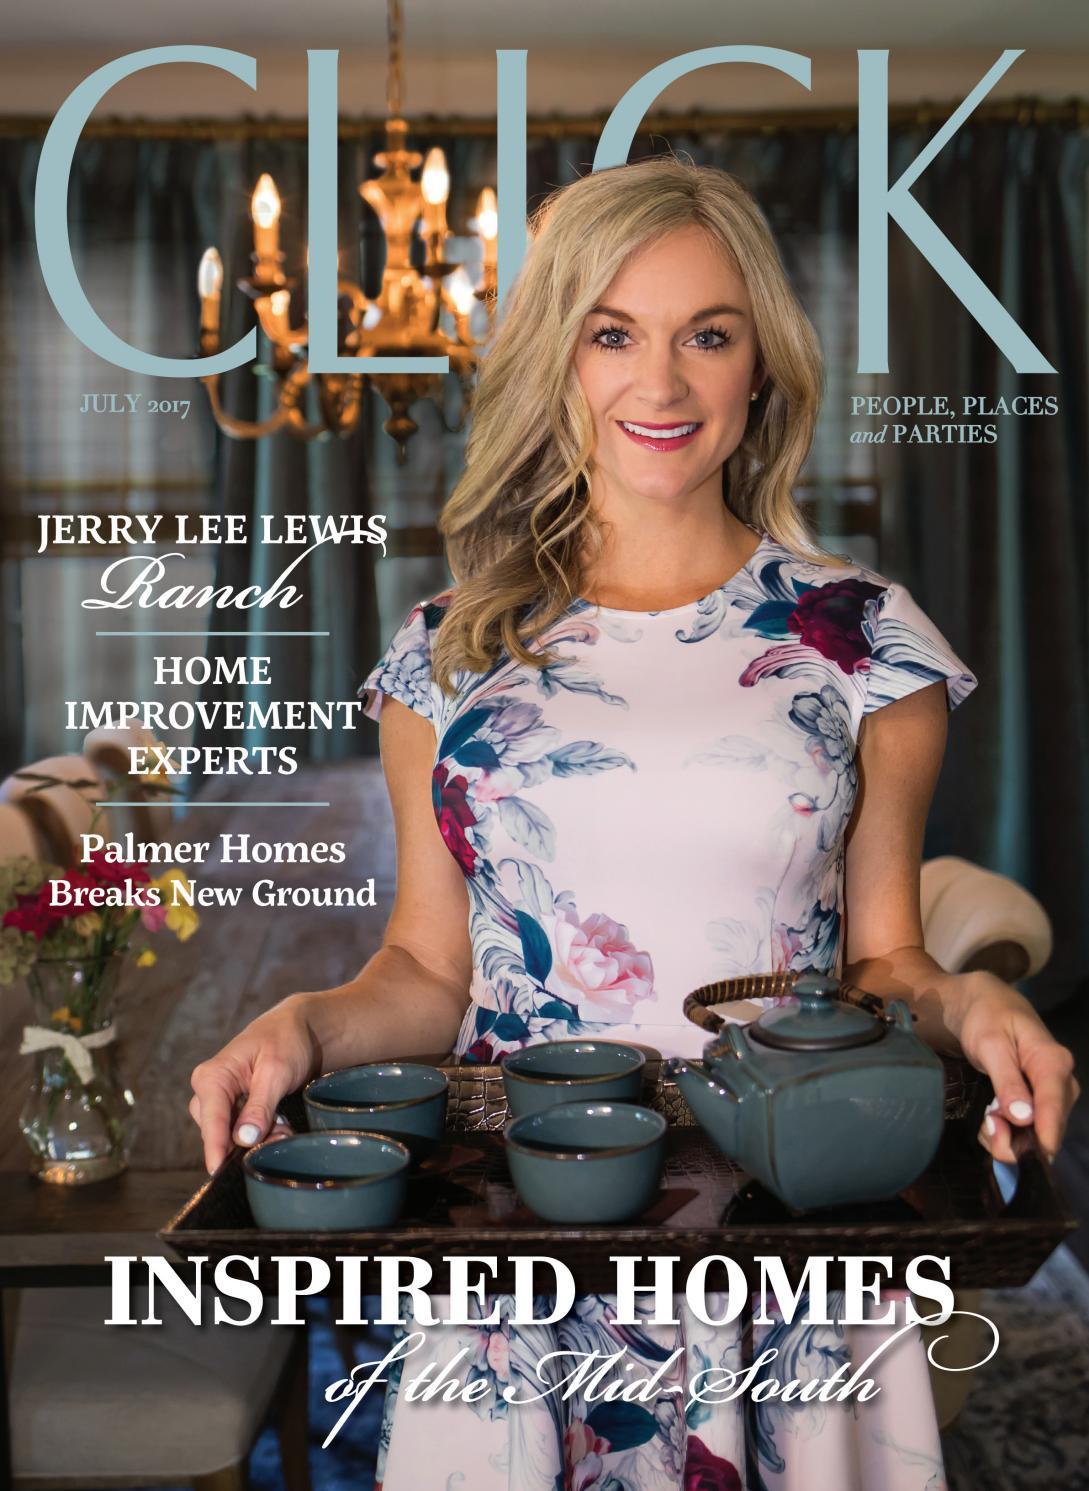 Gary Sullivan Online Home Improvement -